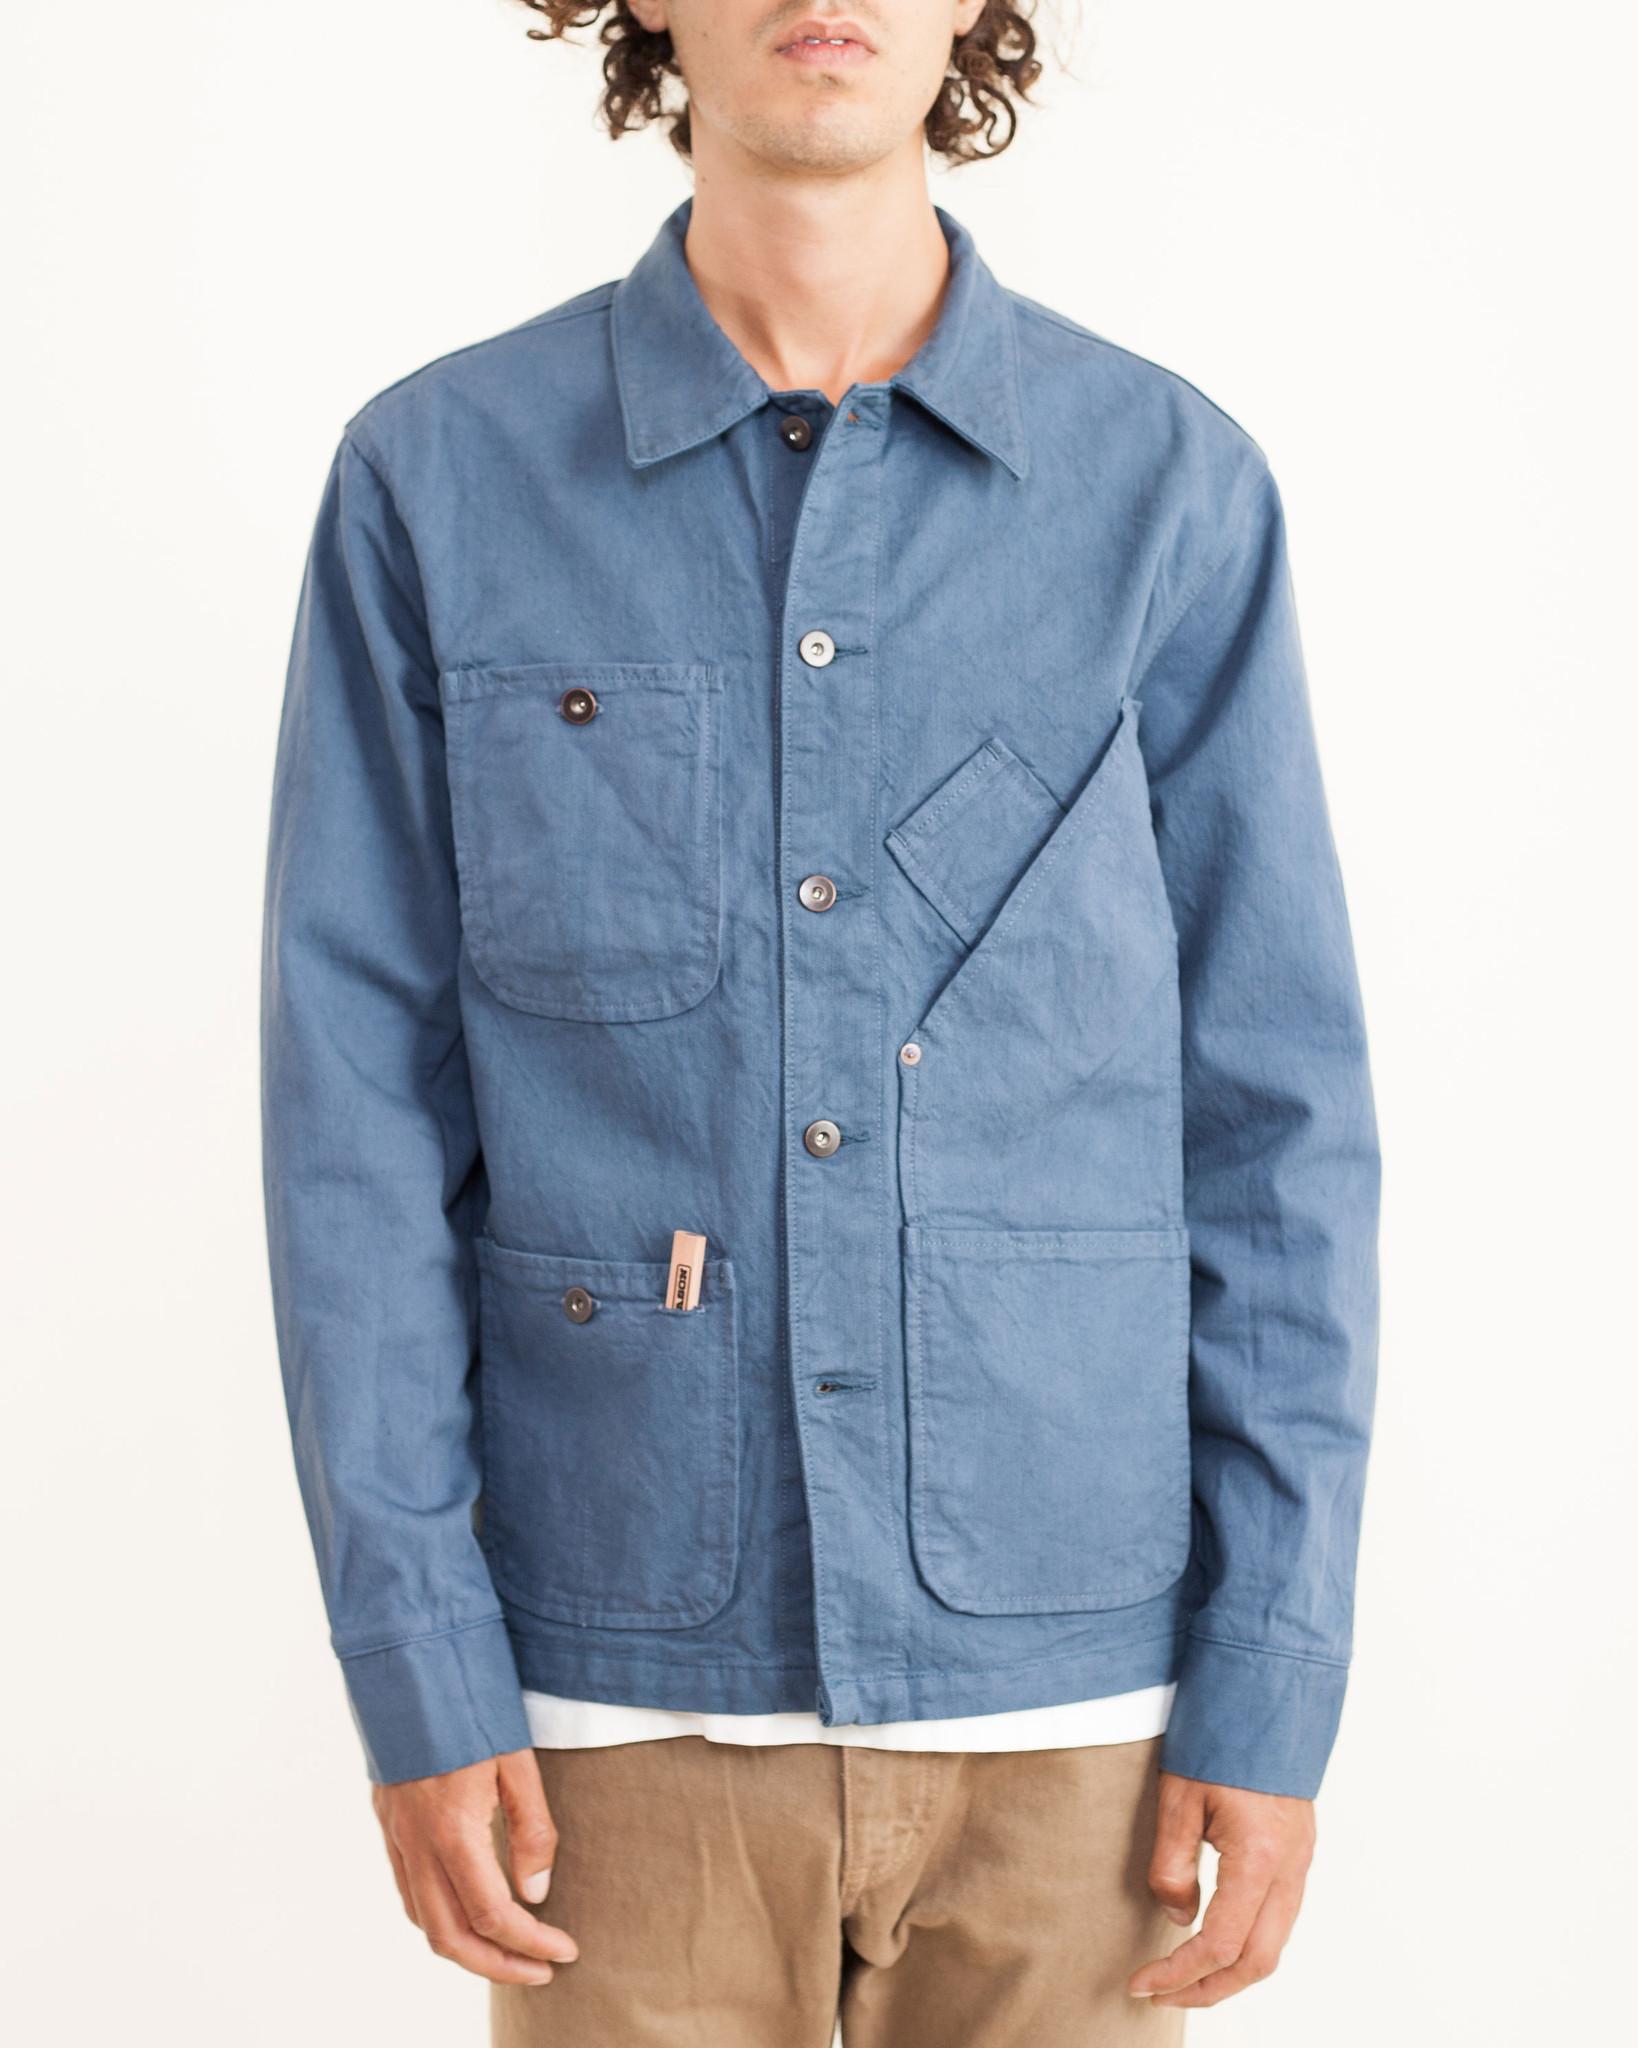 Карманы на пиджаке